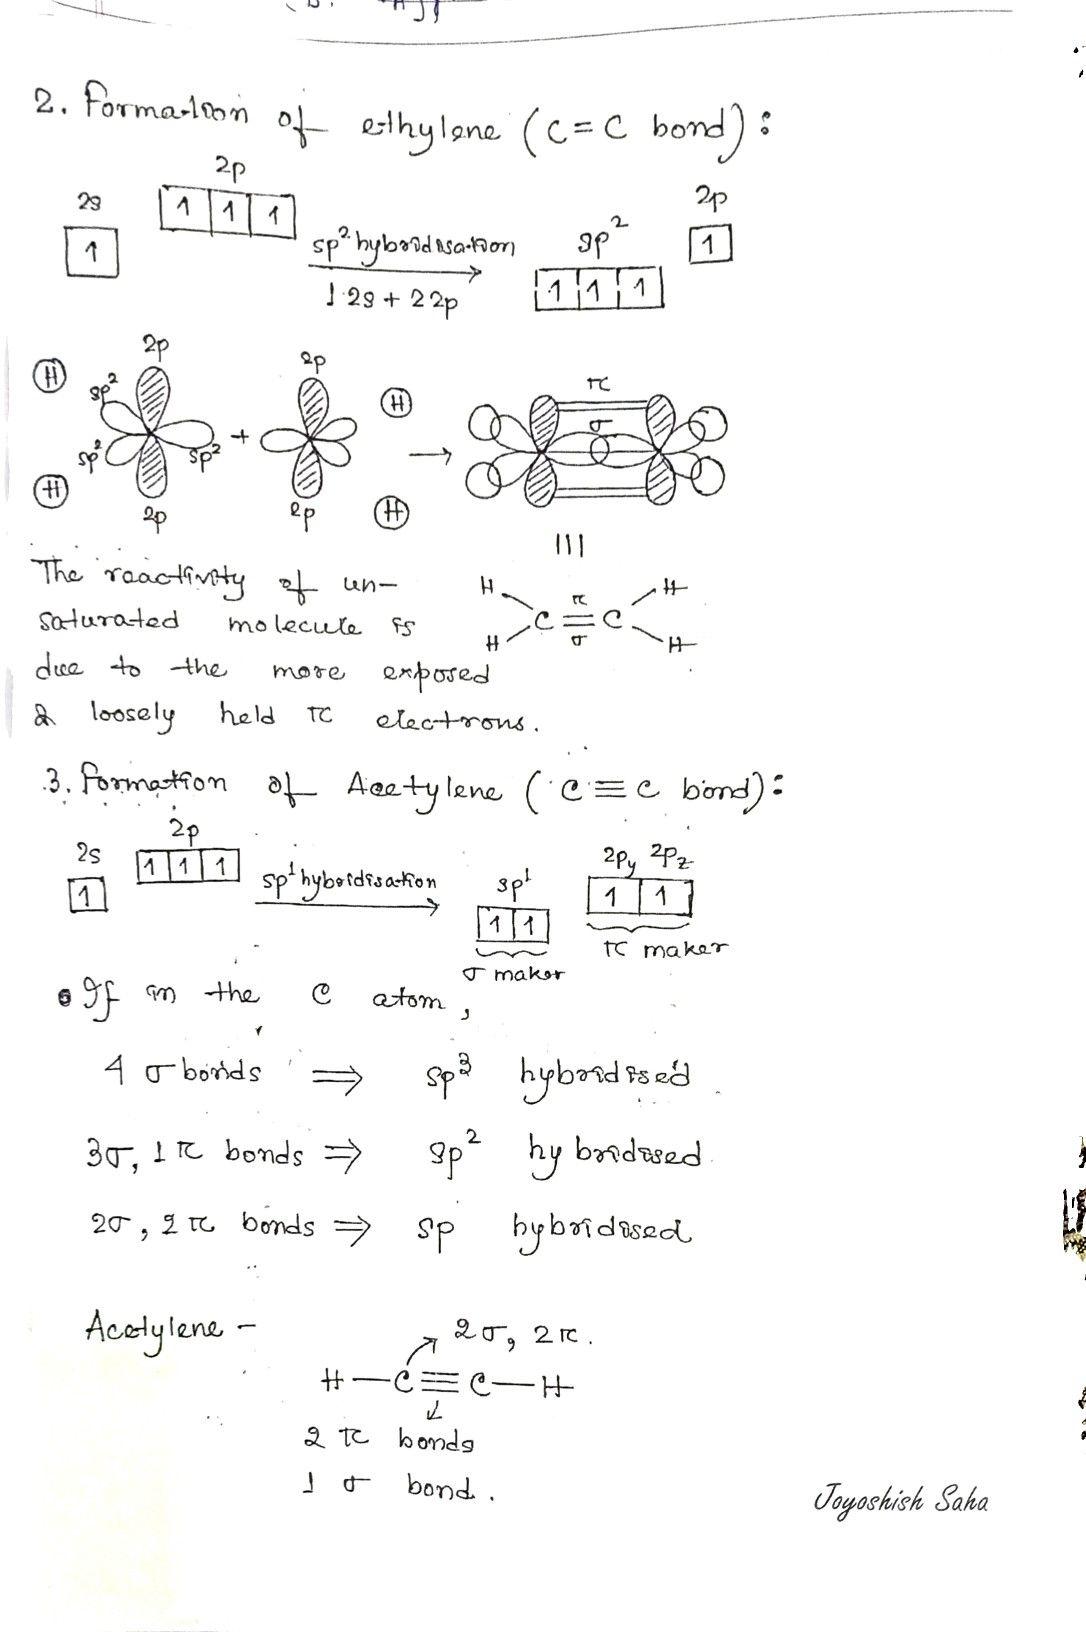 Pin By Truemans Learning On Chemistry In 2021 [ 1632 x 1086 Pixel ]